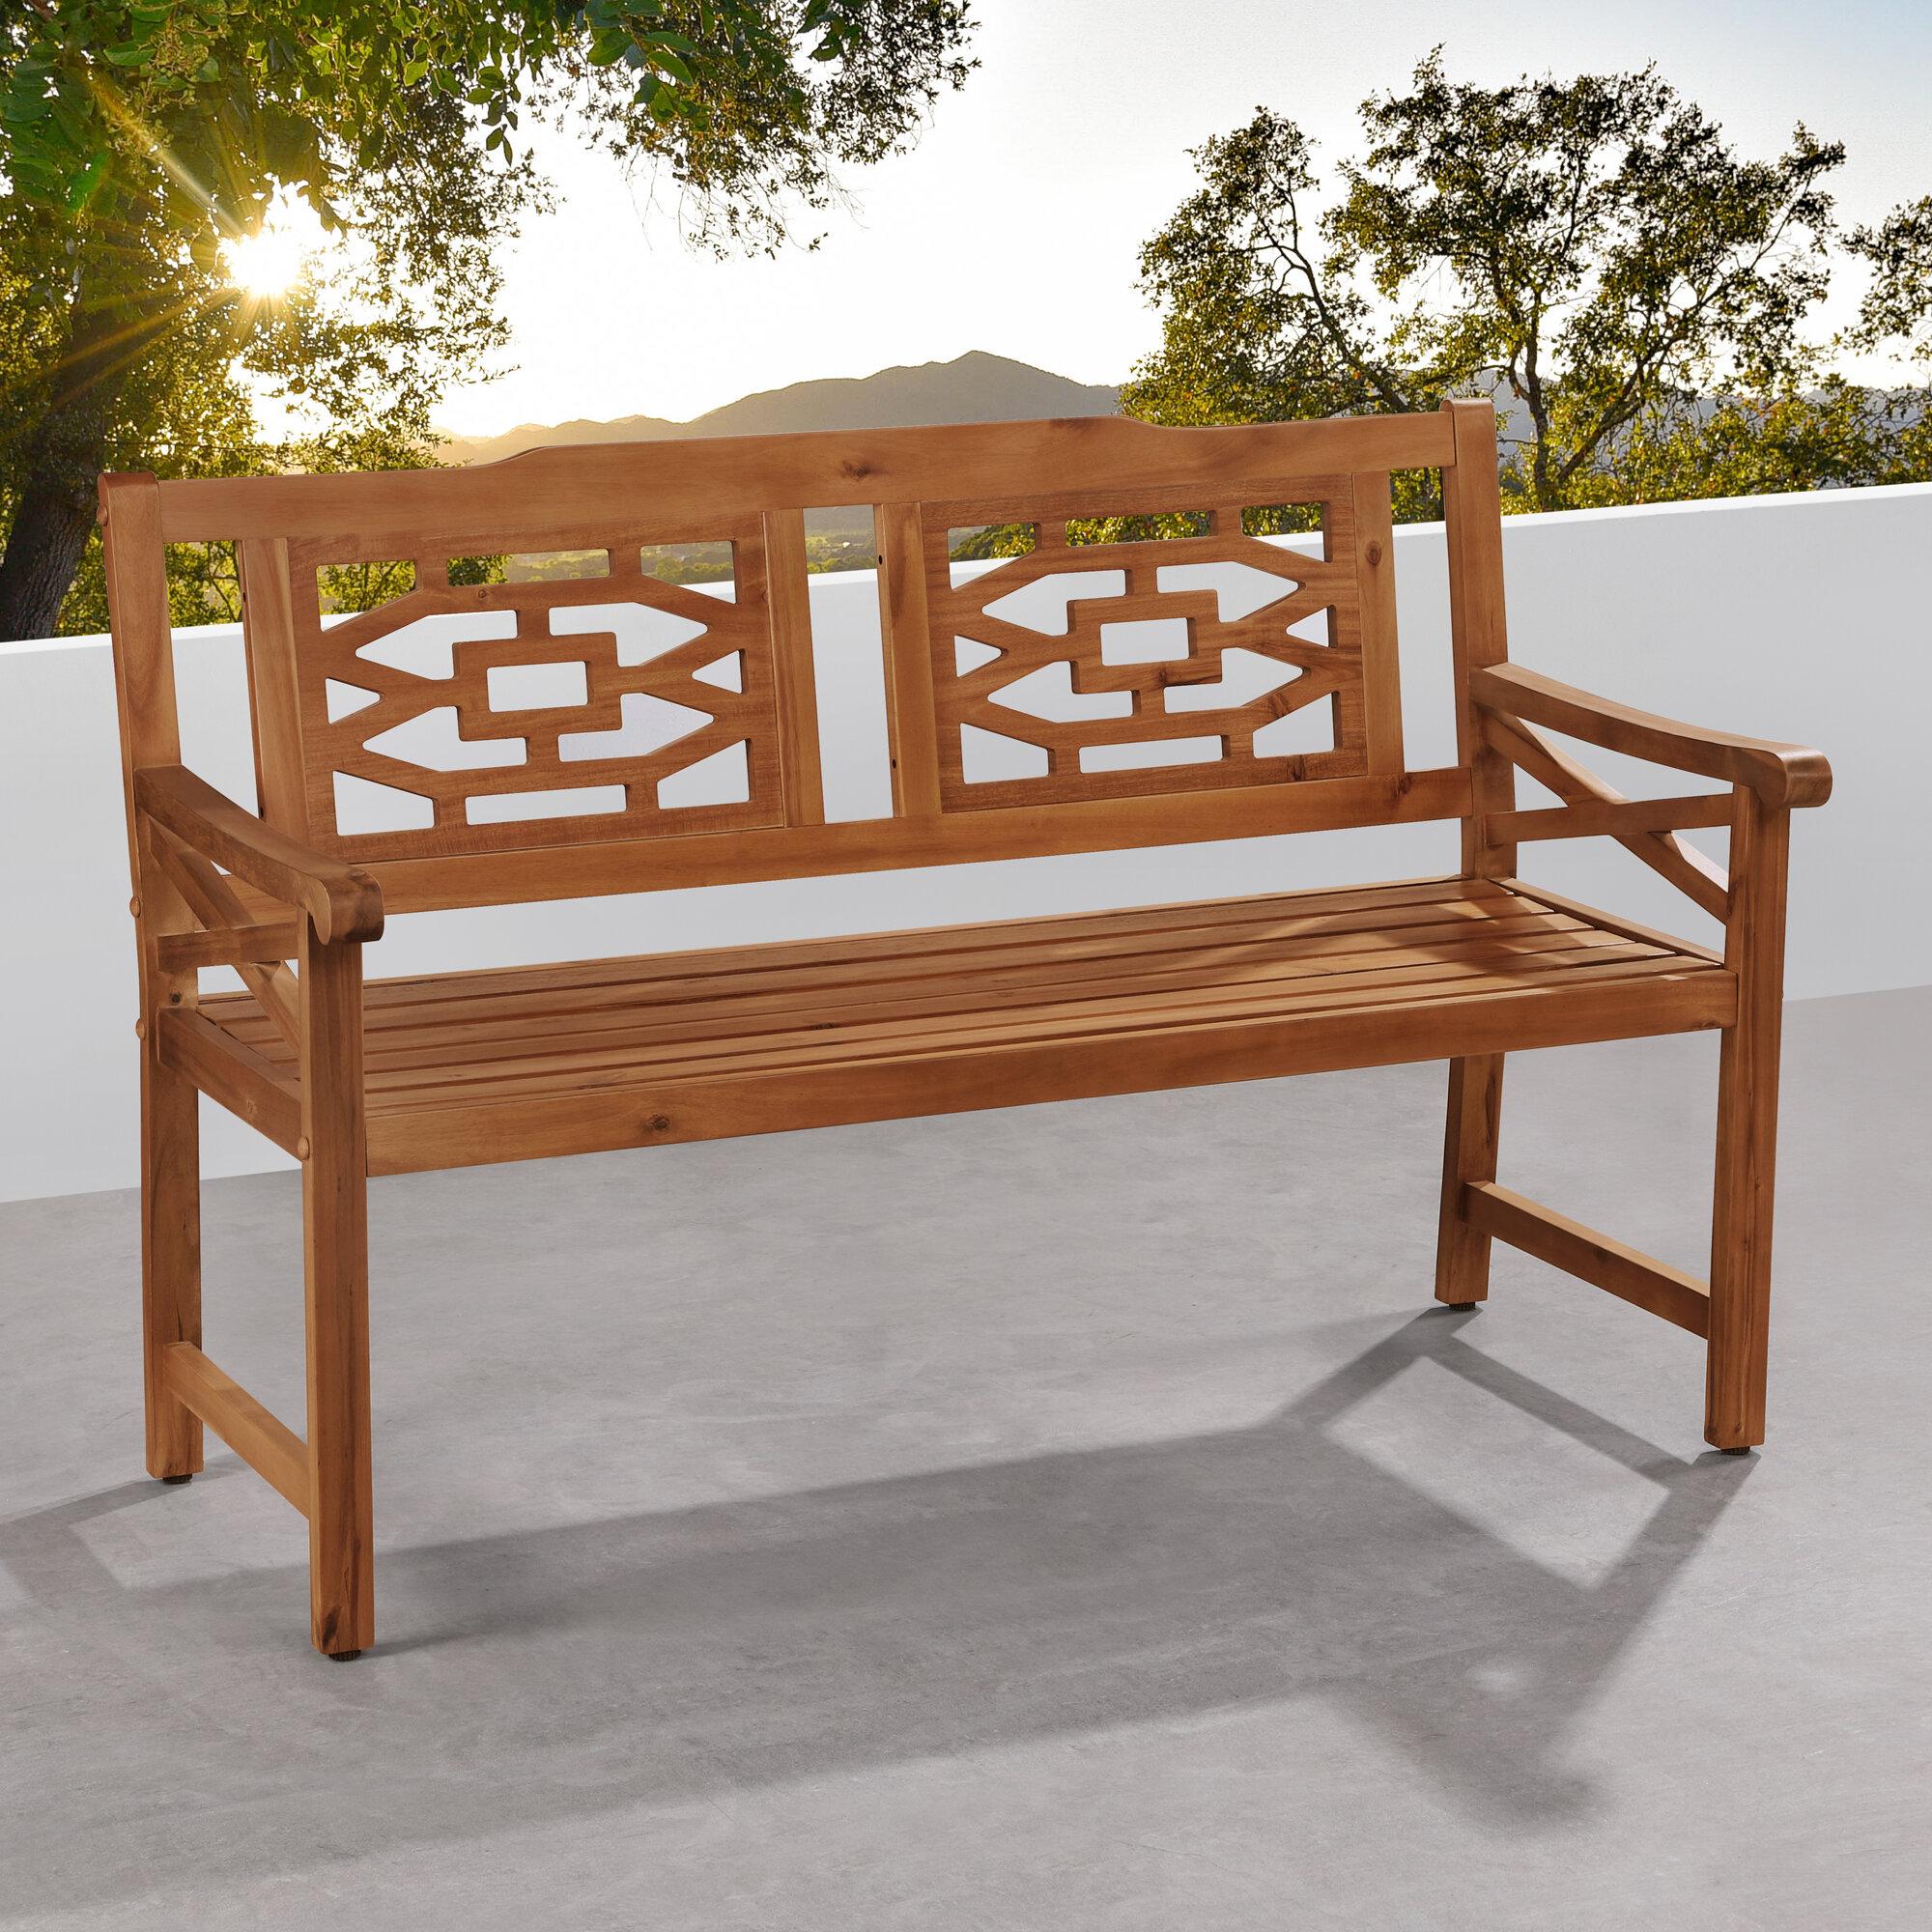 Malay Wooden Garden Bench Throughout Avoca Wood Garden Benches (View 10 of 25)